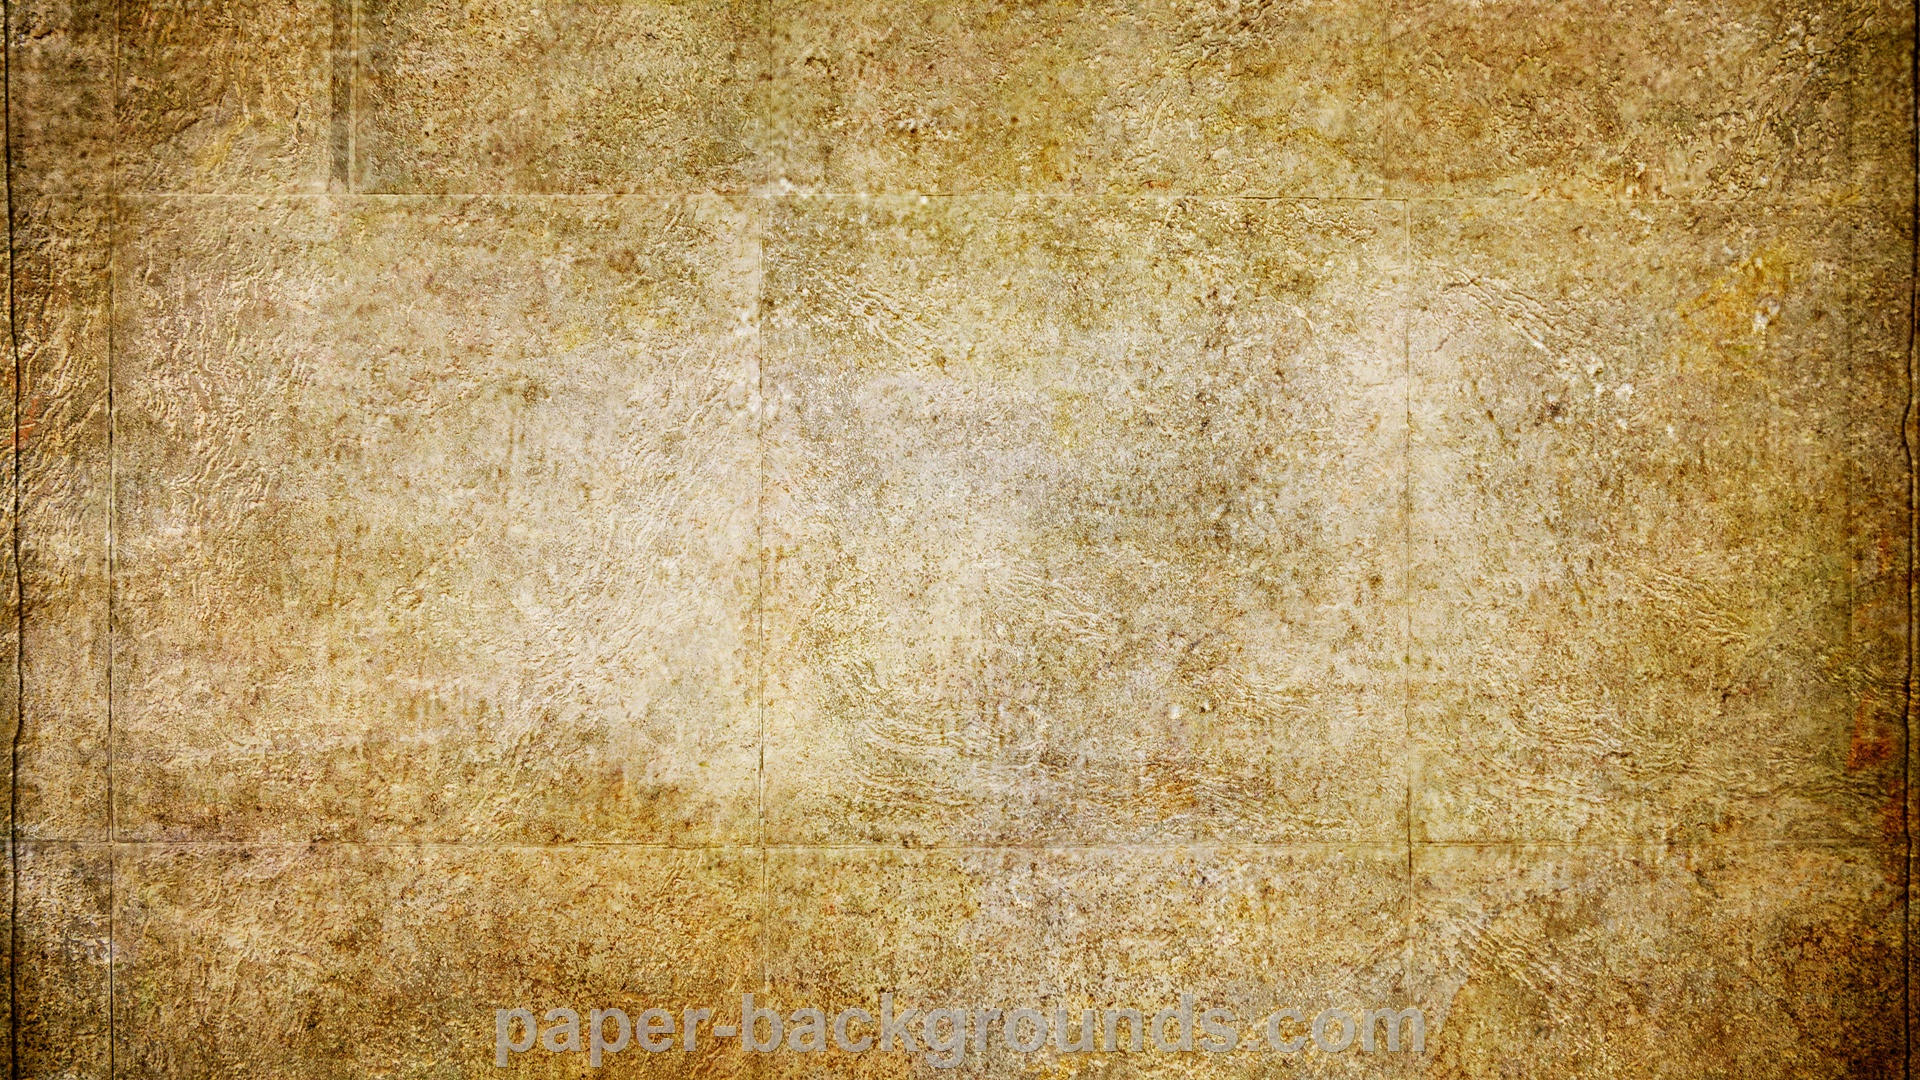 Hd texture wallpaper wallpapersafari for Full wall wallpaper